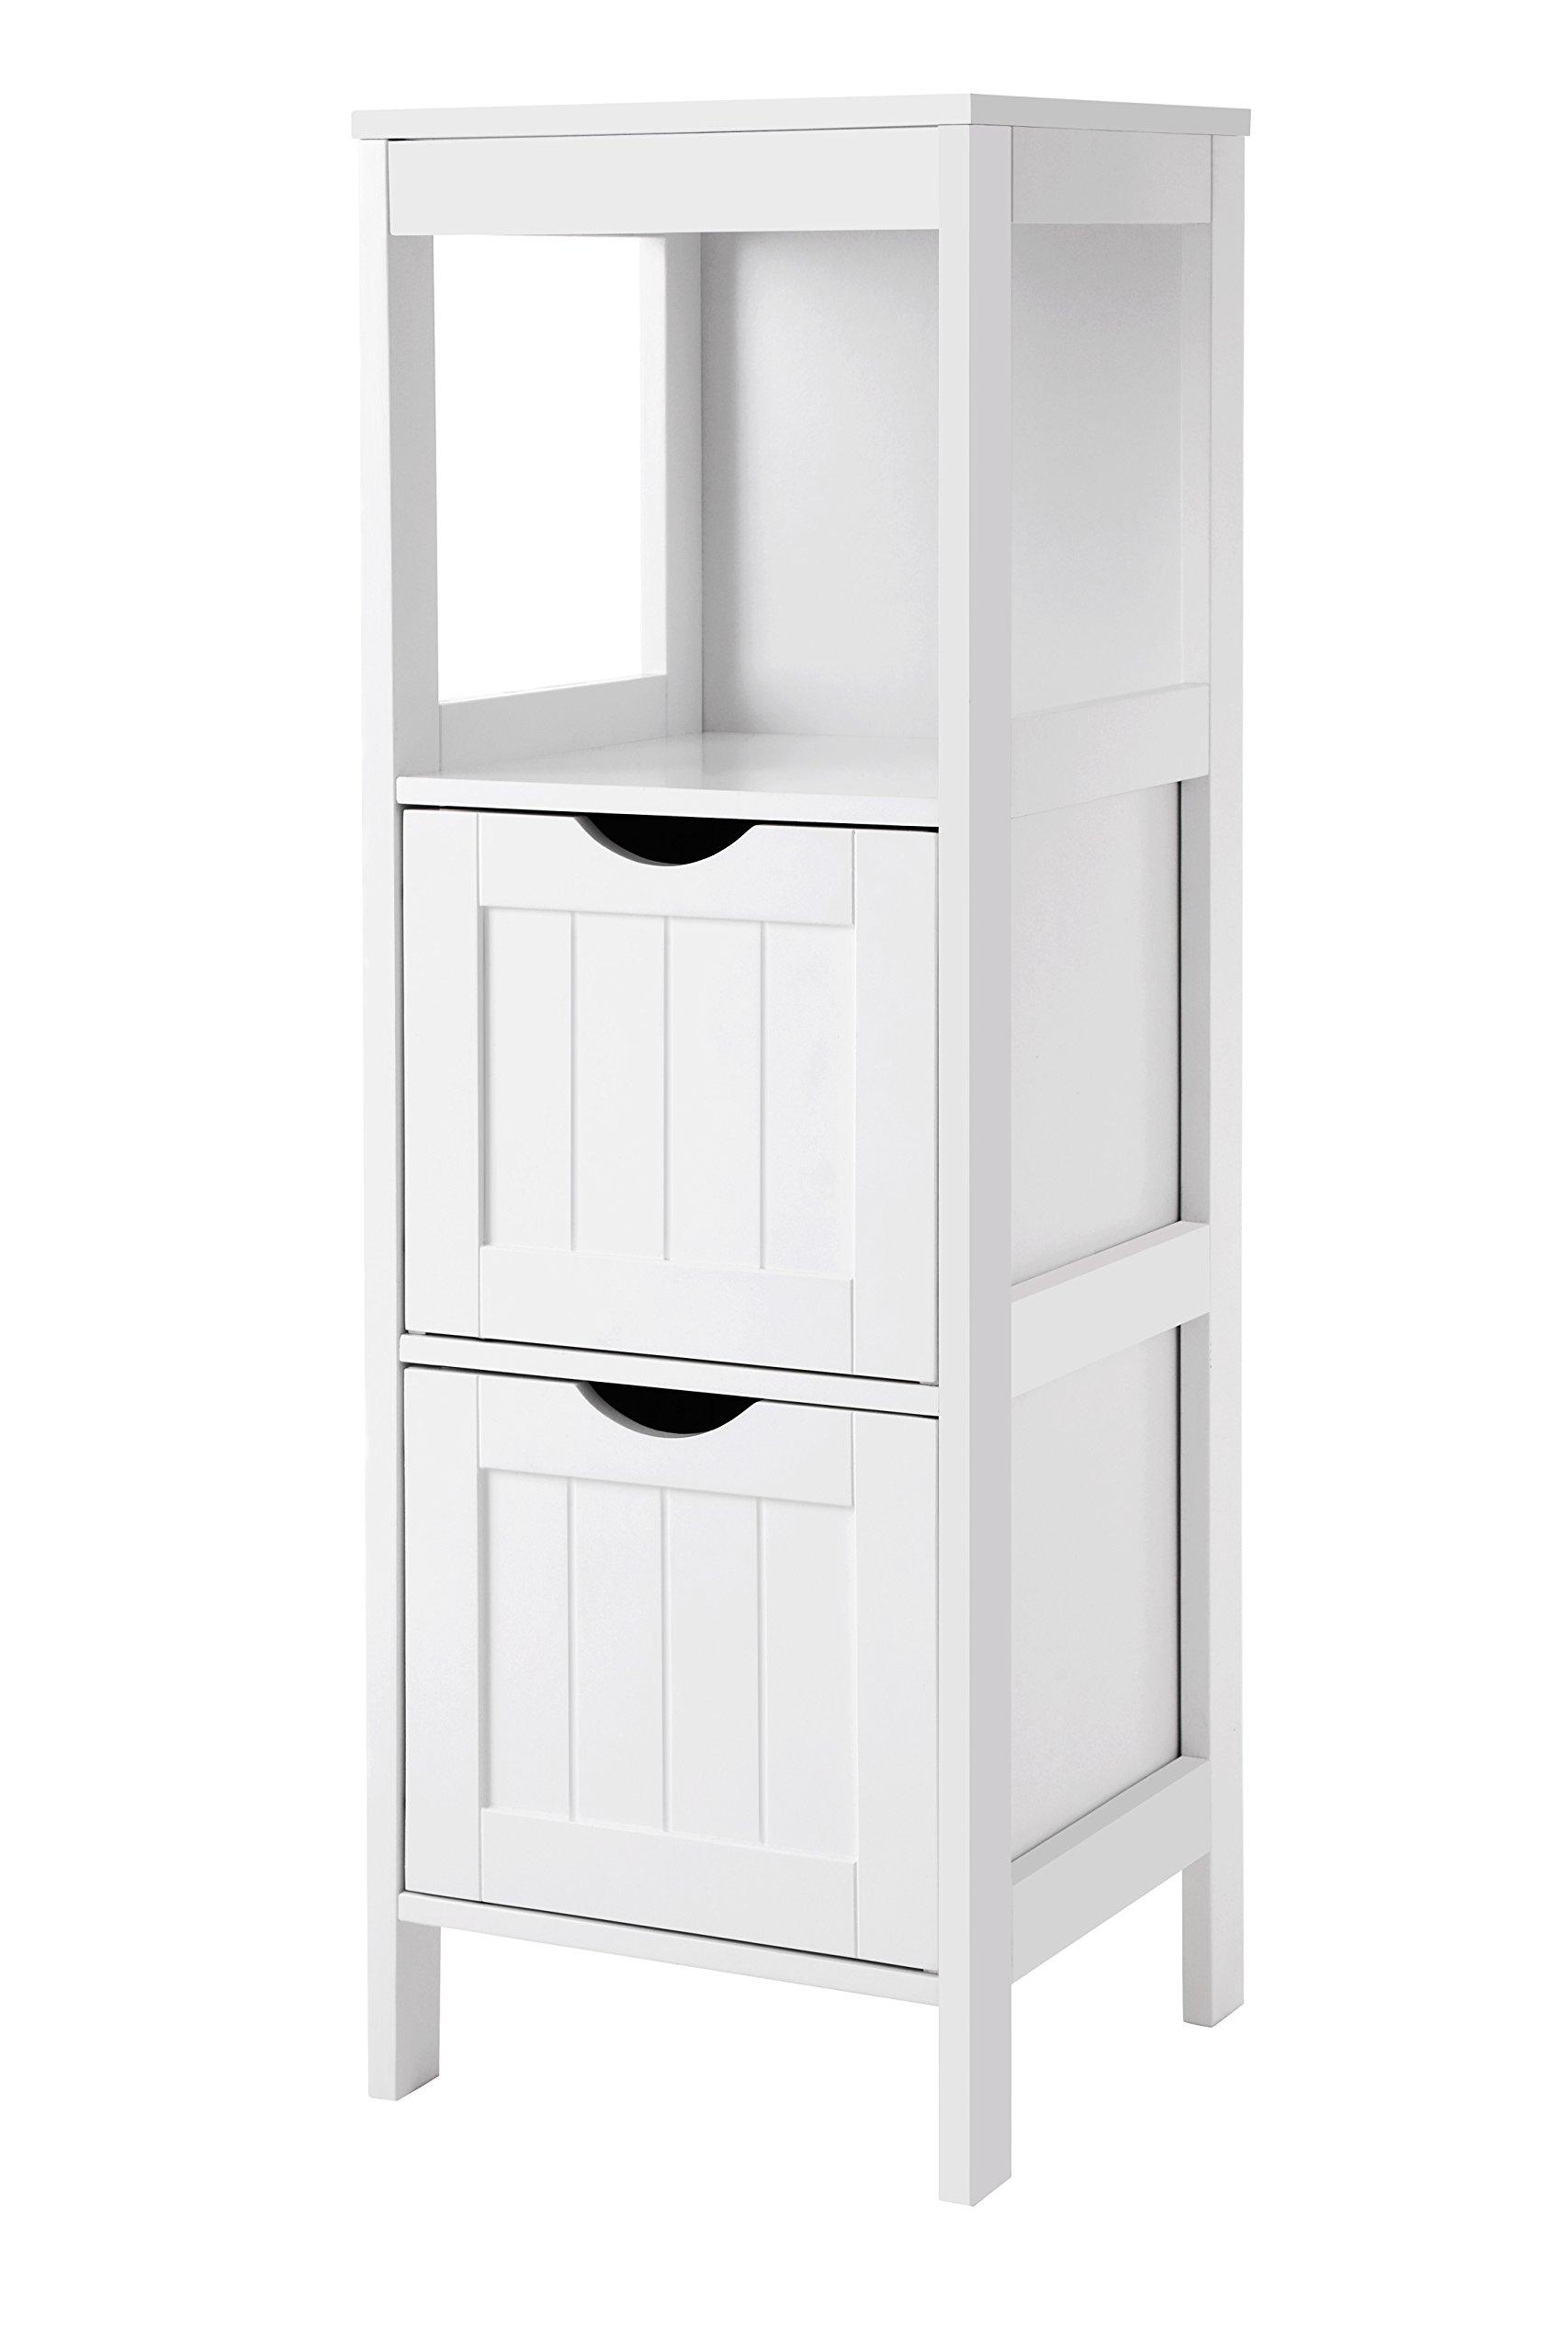 SONGMICS Bathroom Floor Cabinet Multifunctional Bathroom Storage Organizer Rack Stand 2 Drawers White UBBC42WT